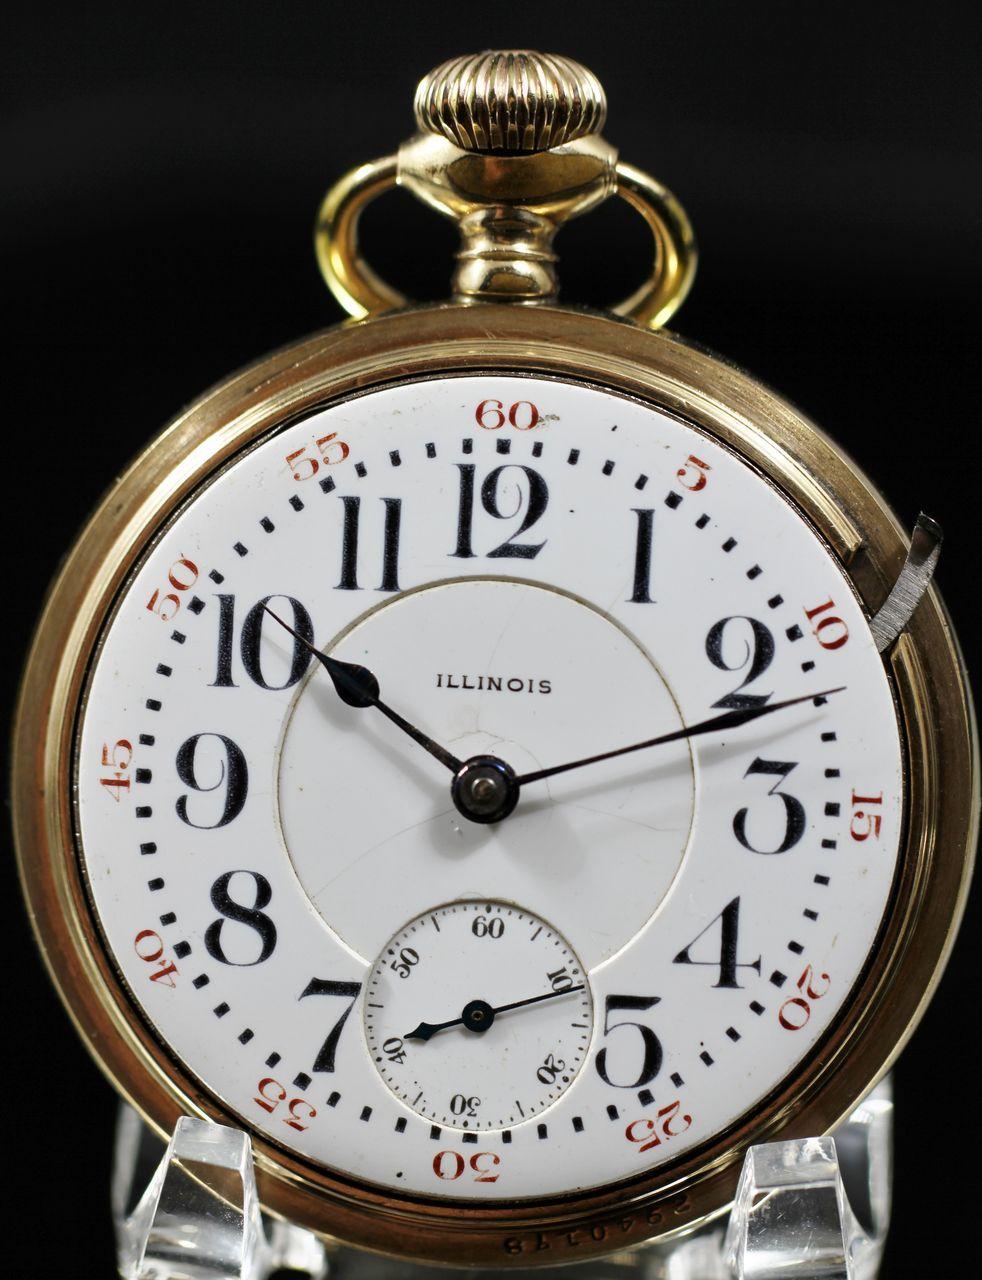 Illinois Railroad Grade Size 18 Pocket Watch From 1915